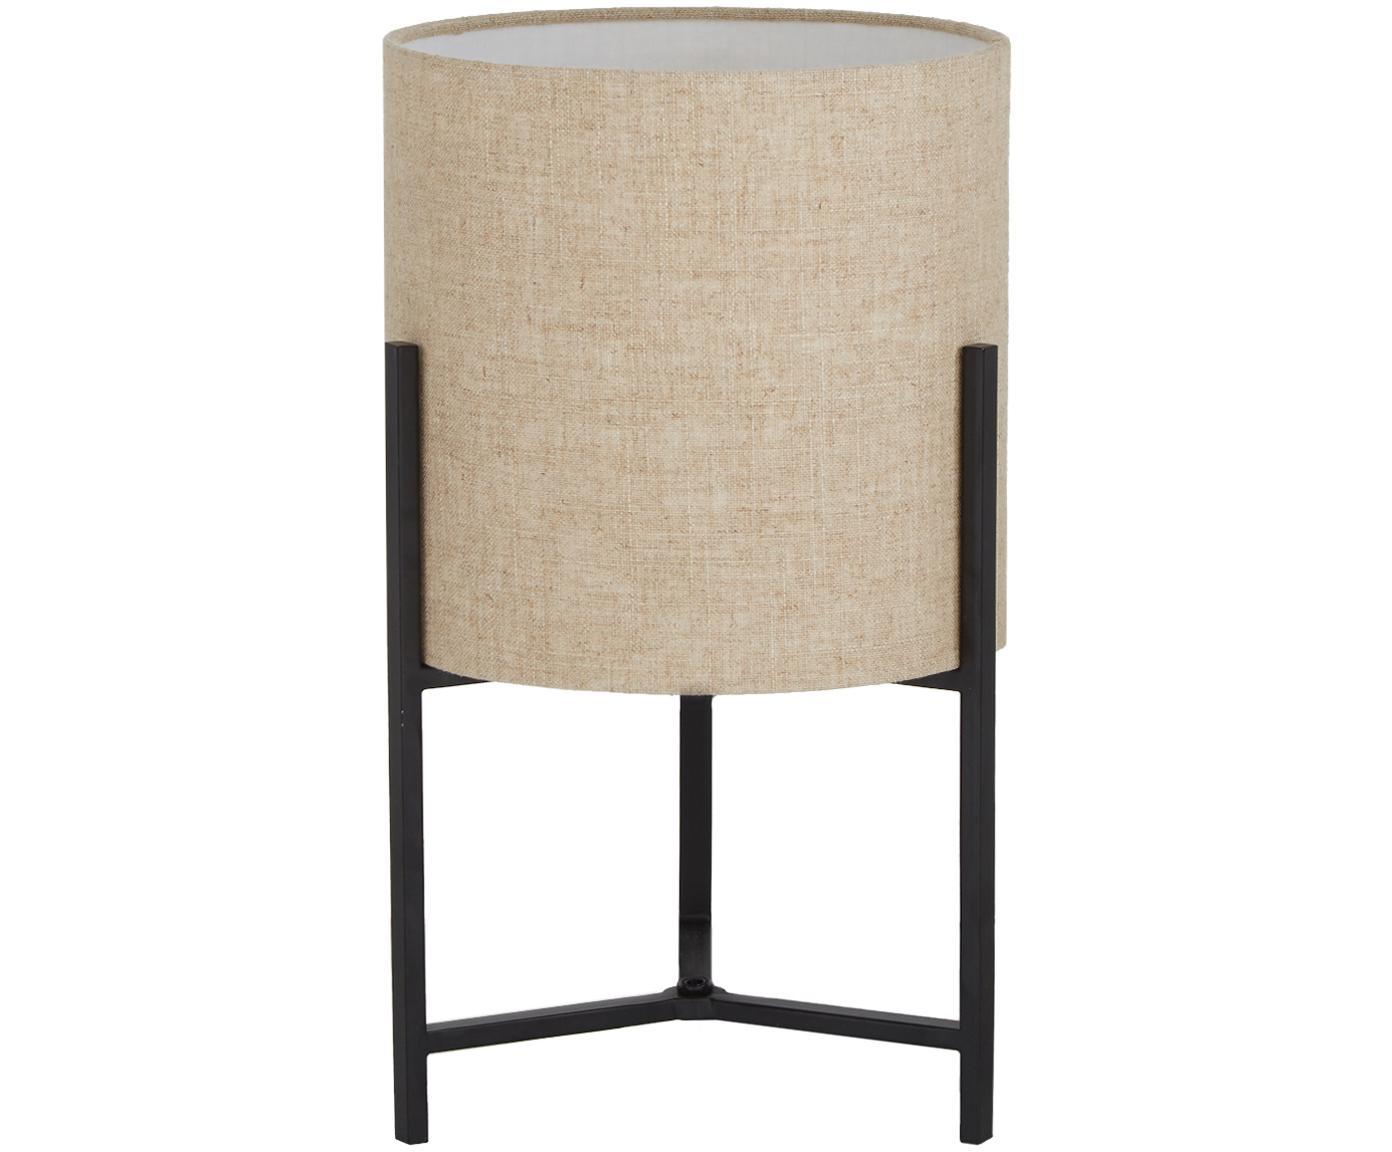 Lampada da tavolo Piper, Paralume: 85% lino, 15% terylen, Beige, Ø 22 x Alt. 38 cm